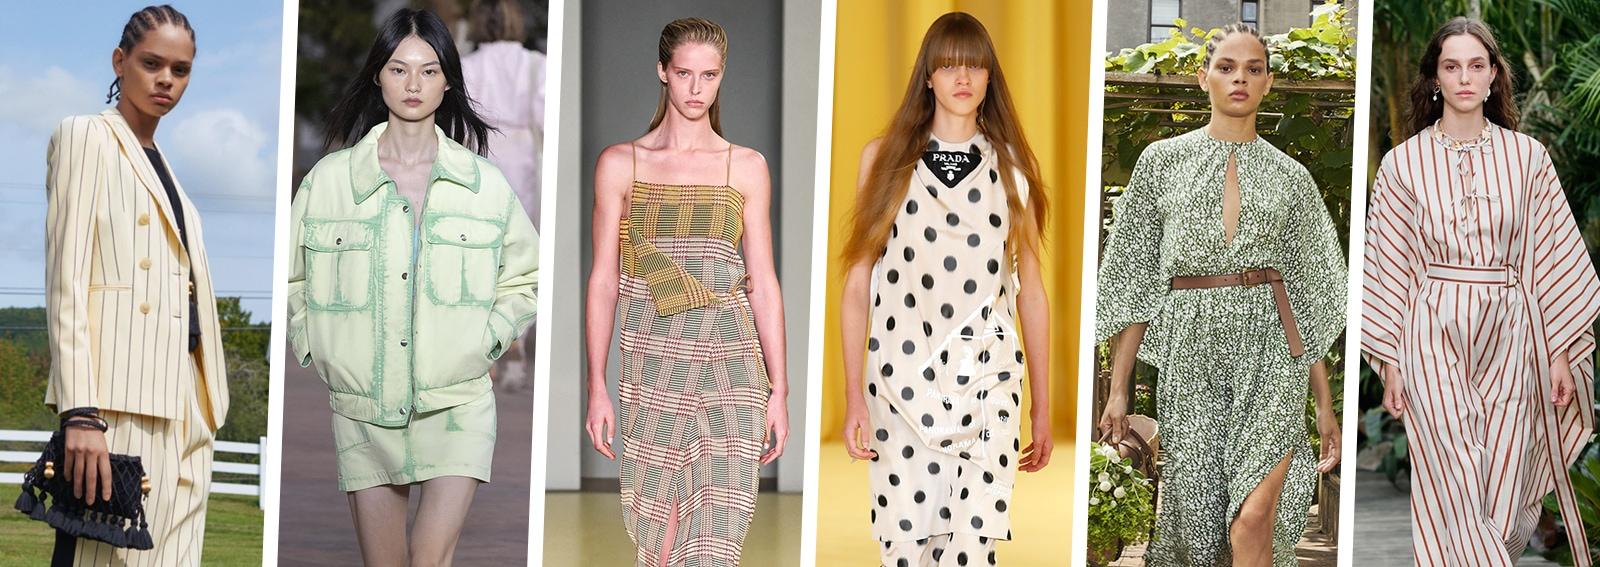 stampe moda estate 2021